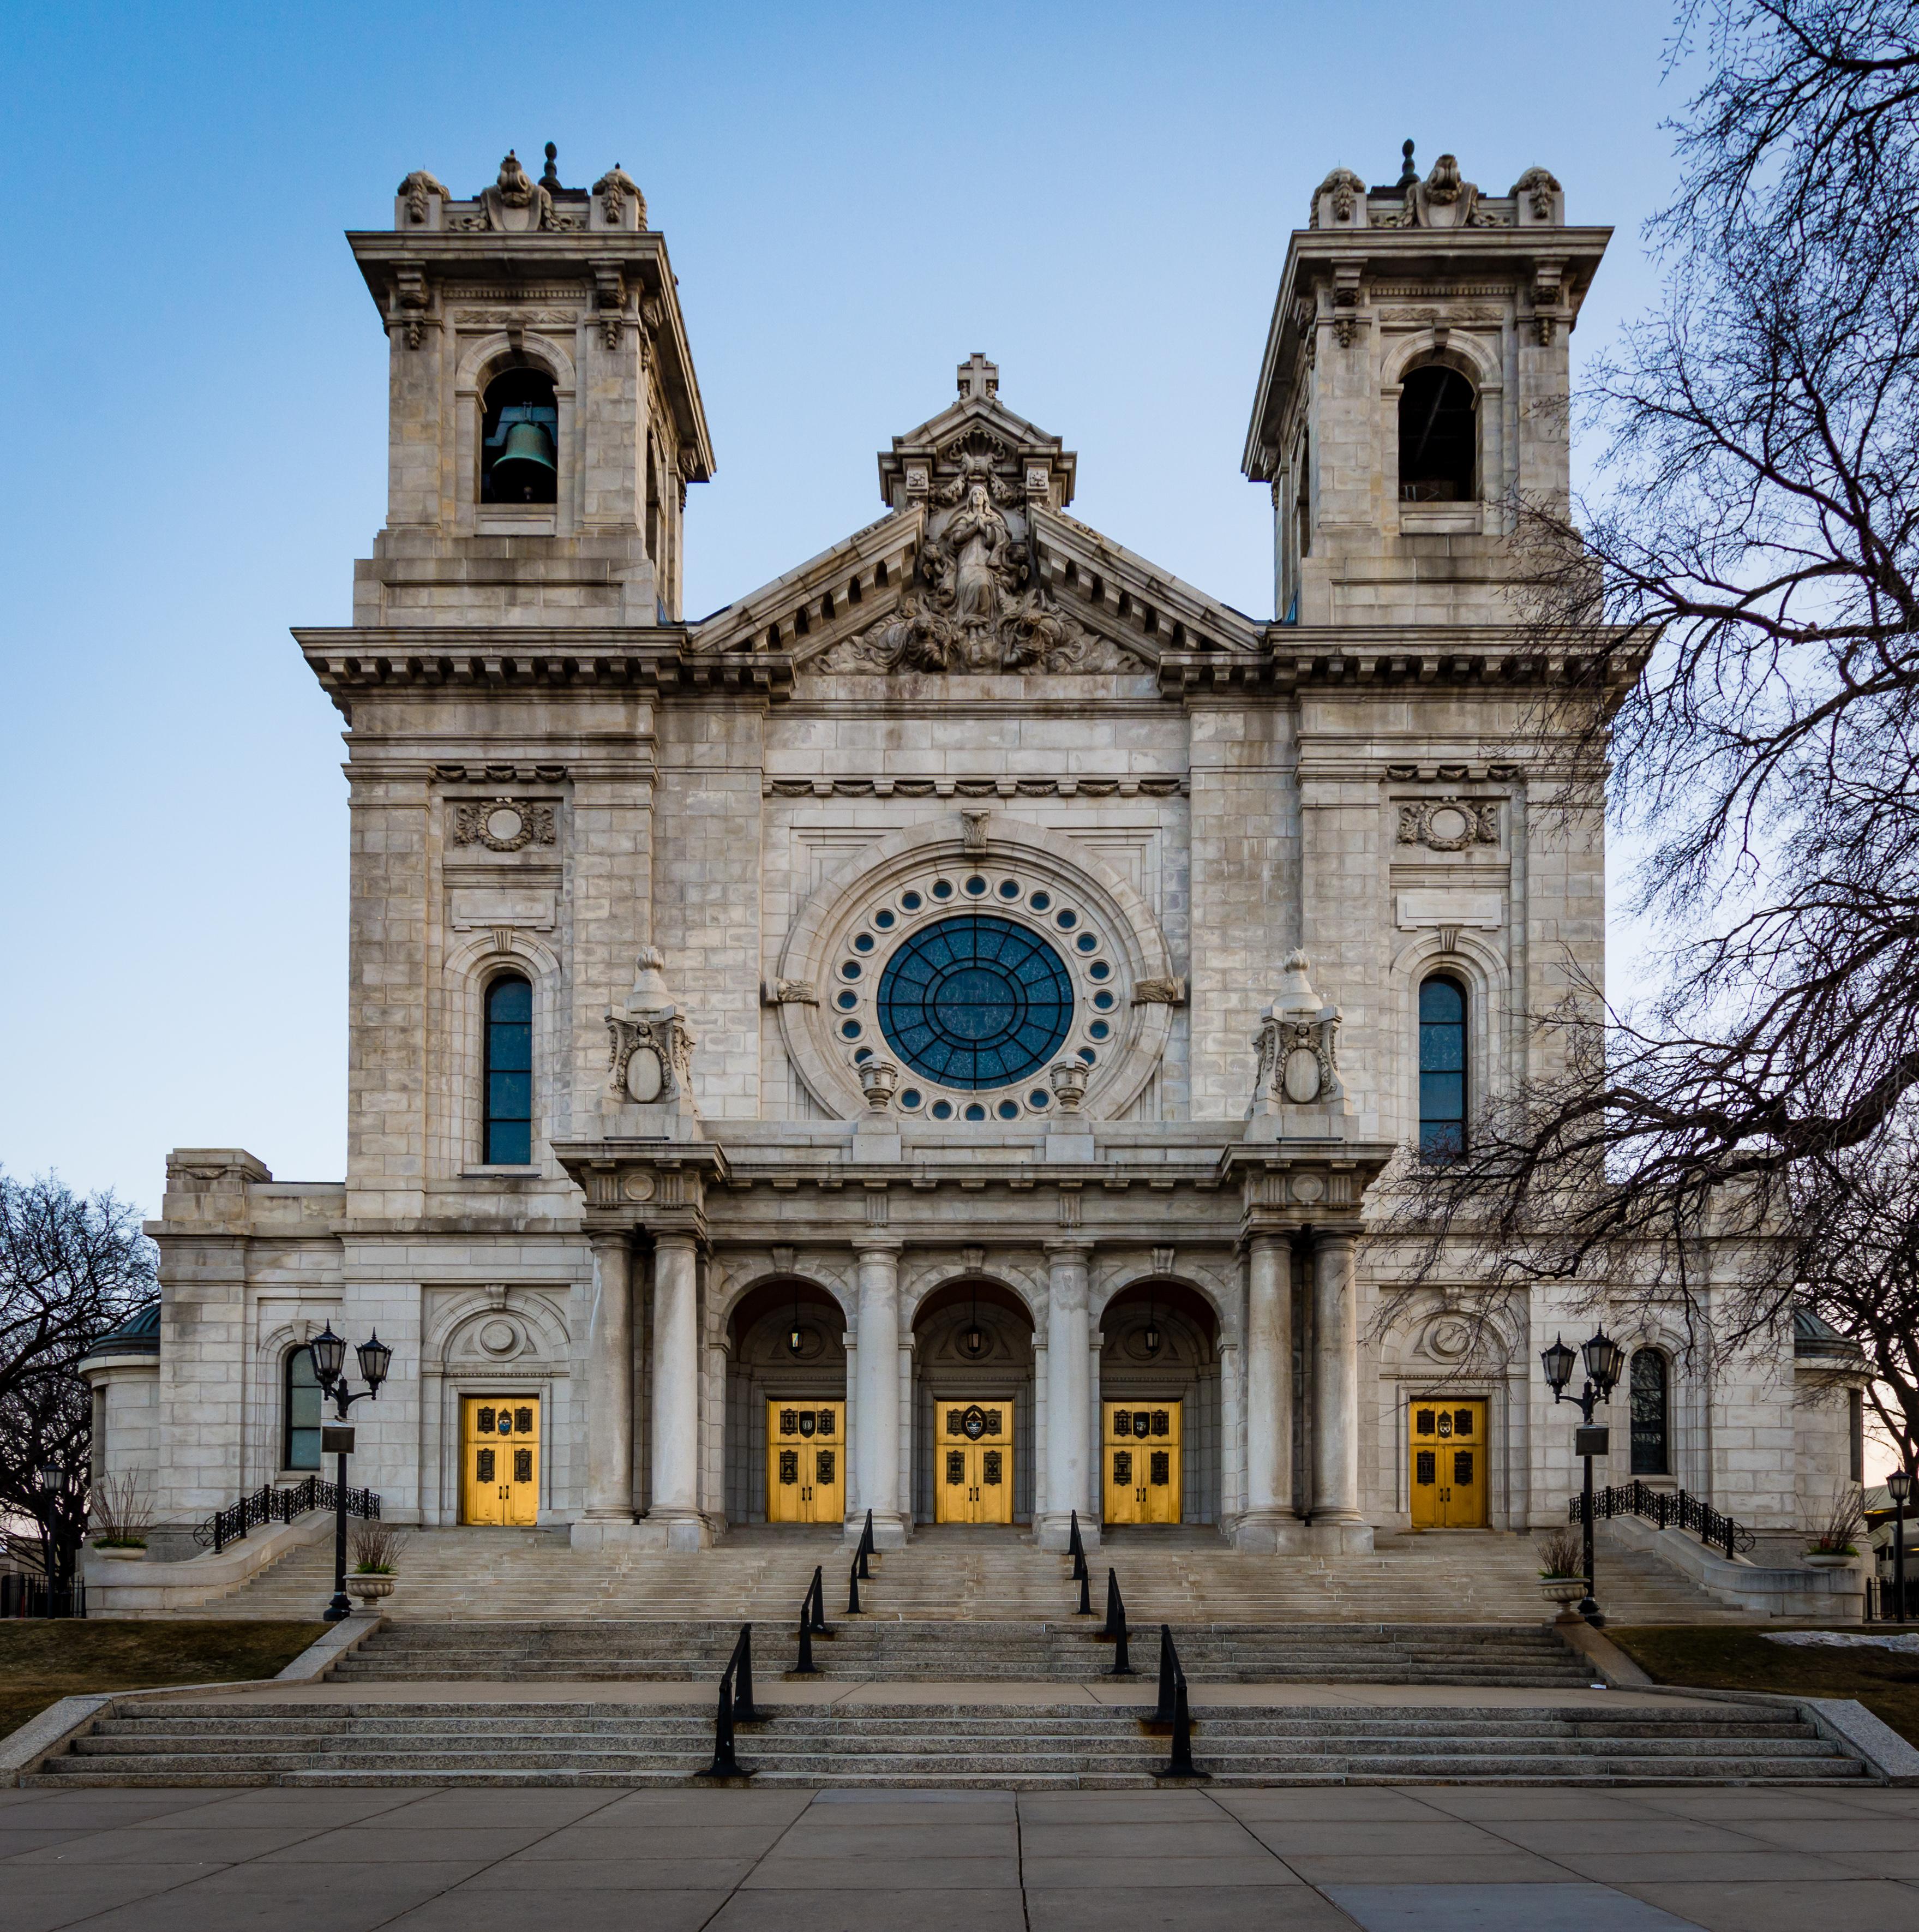 The Basilica of Saint Mary, Architecture, Basilica, Building, Church, HQ Photo